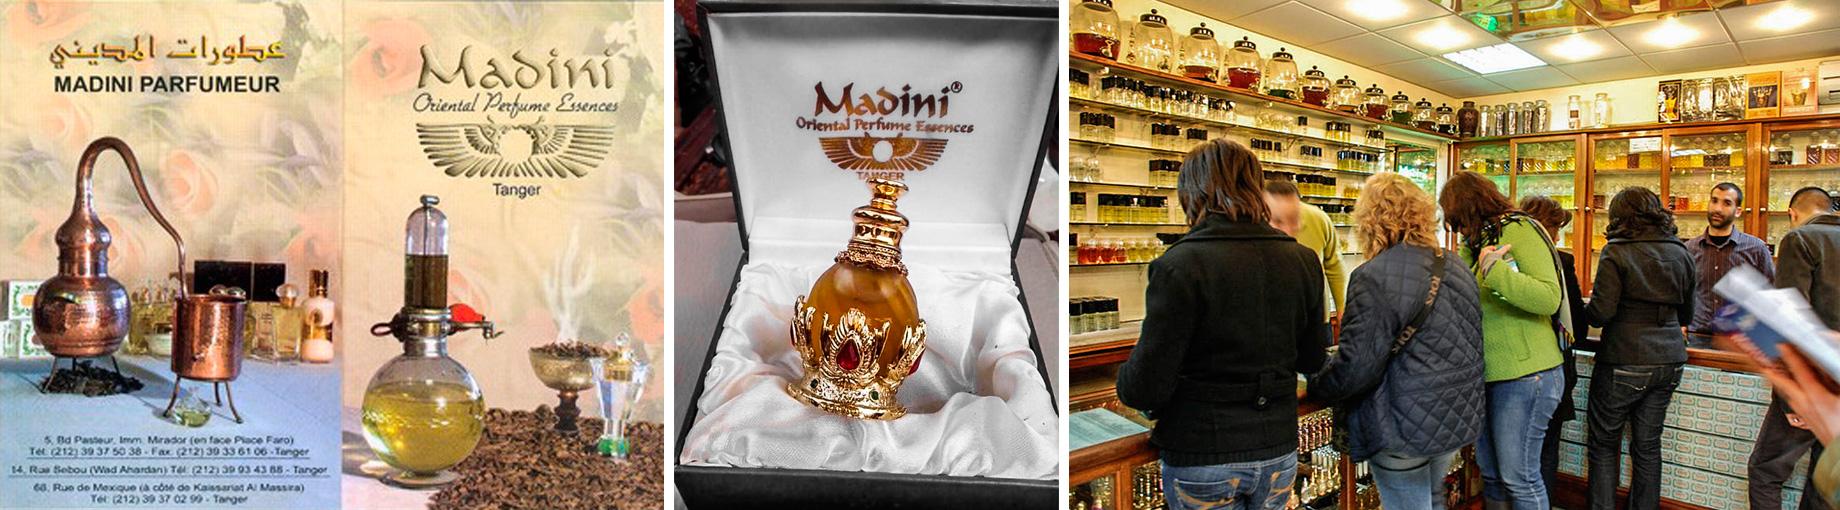 madini_parfums